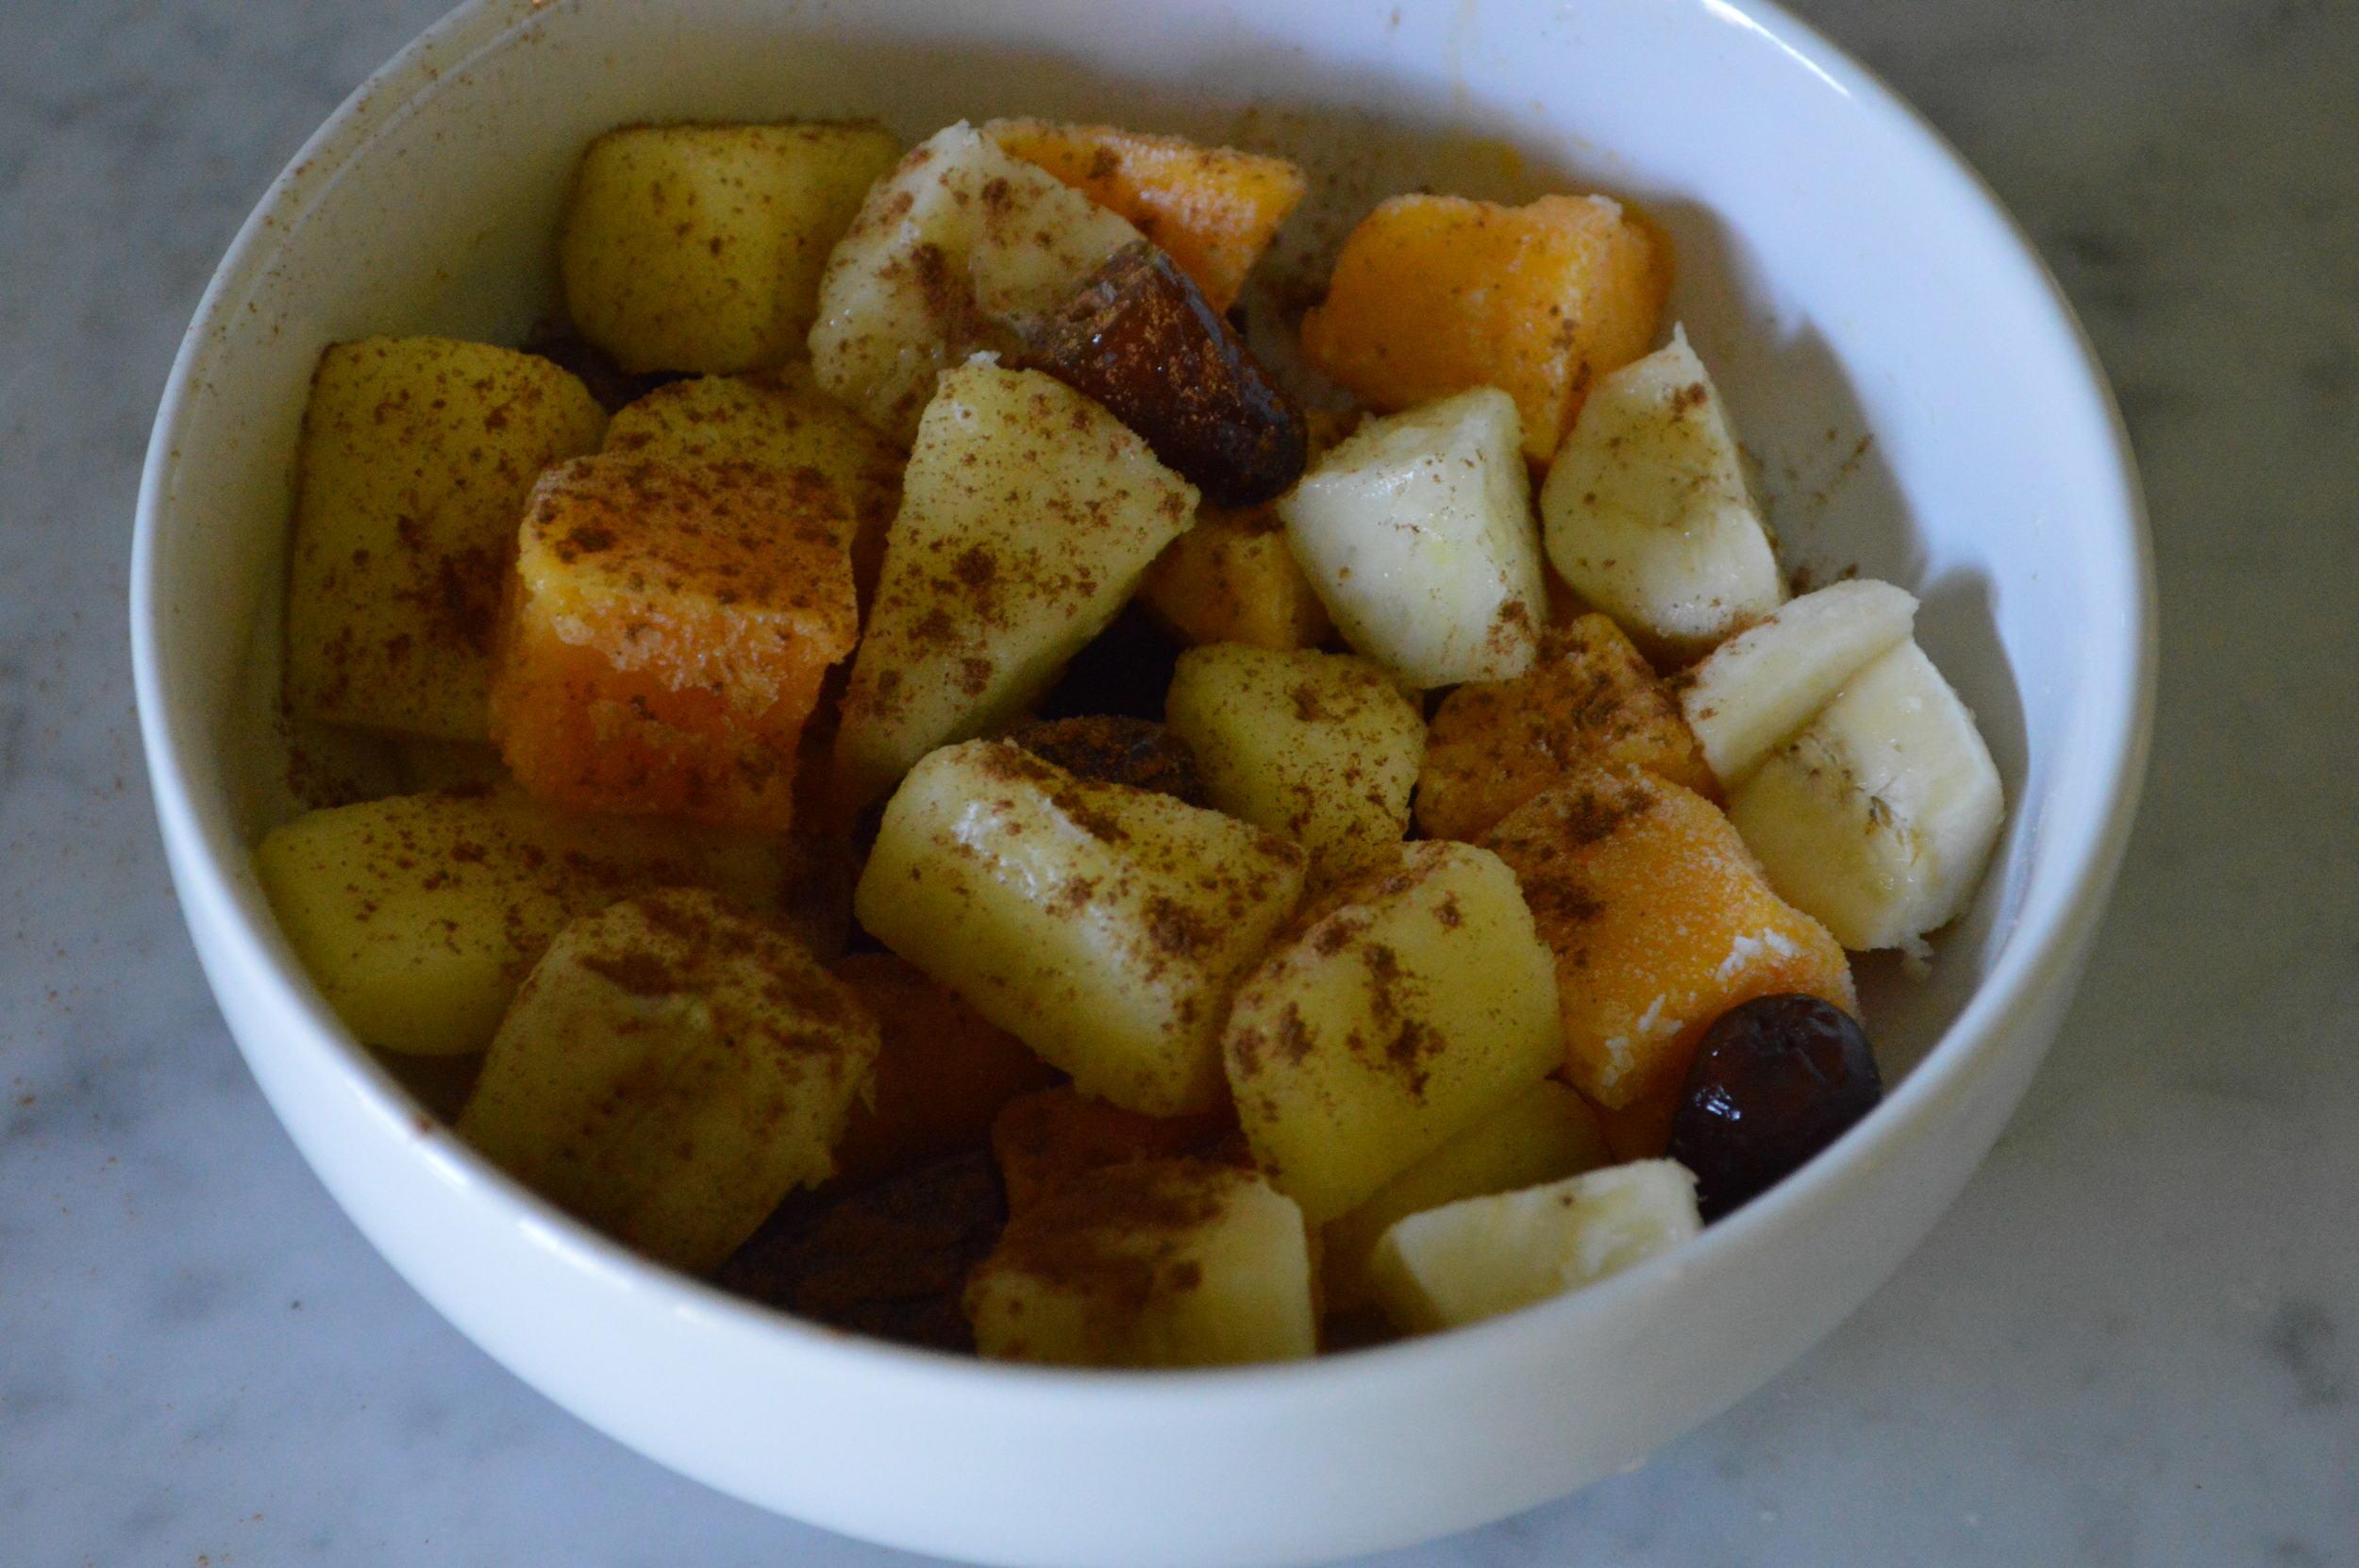 fruits + cinnamon